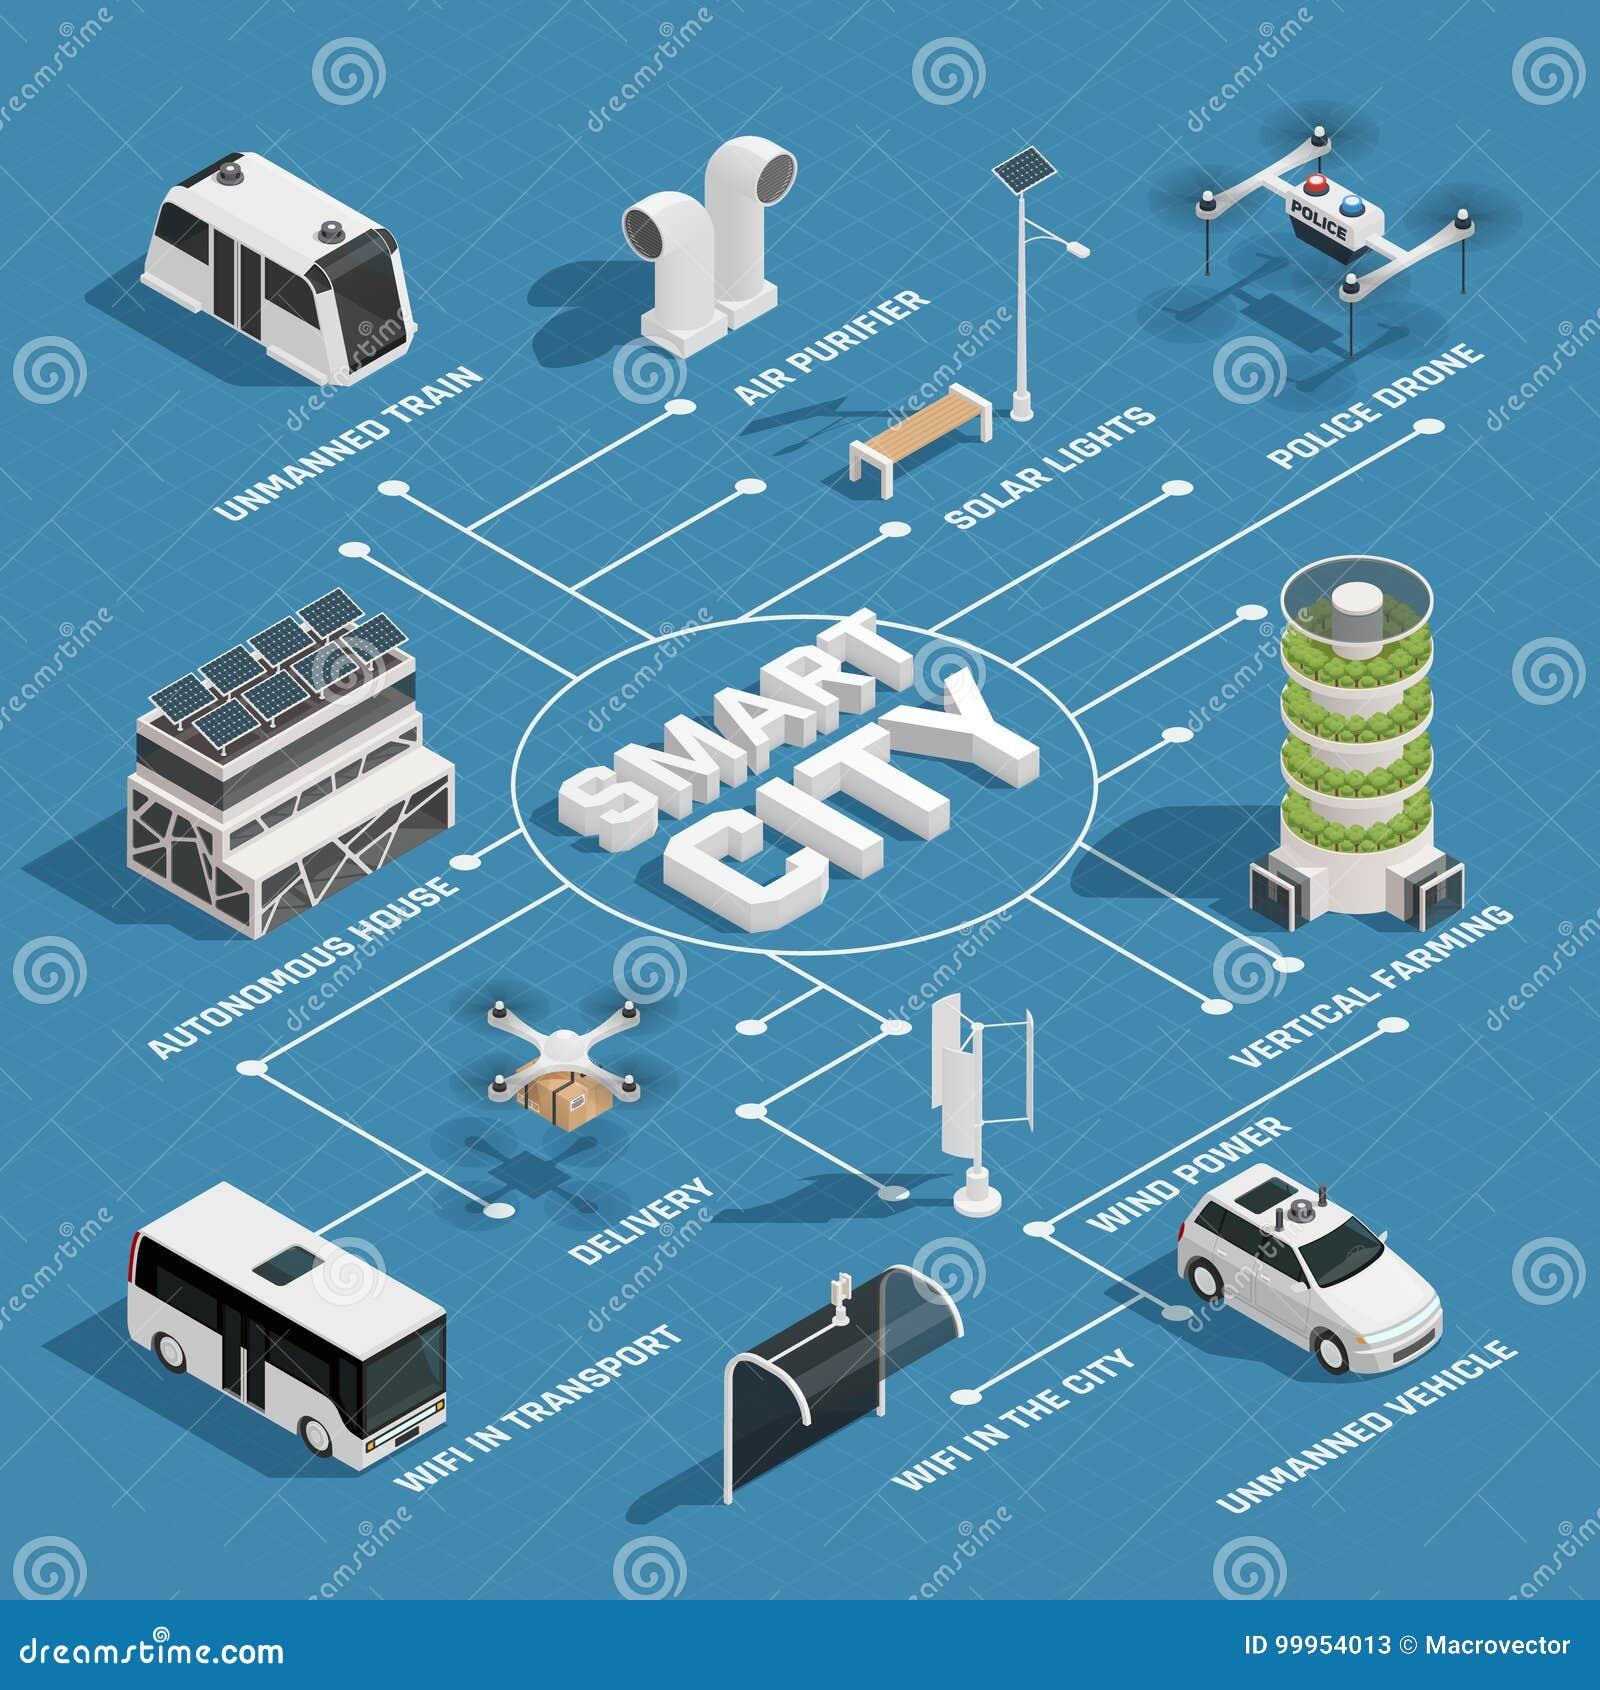 Smart City Technology Isometric Flowchart